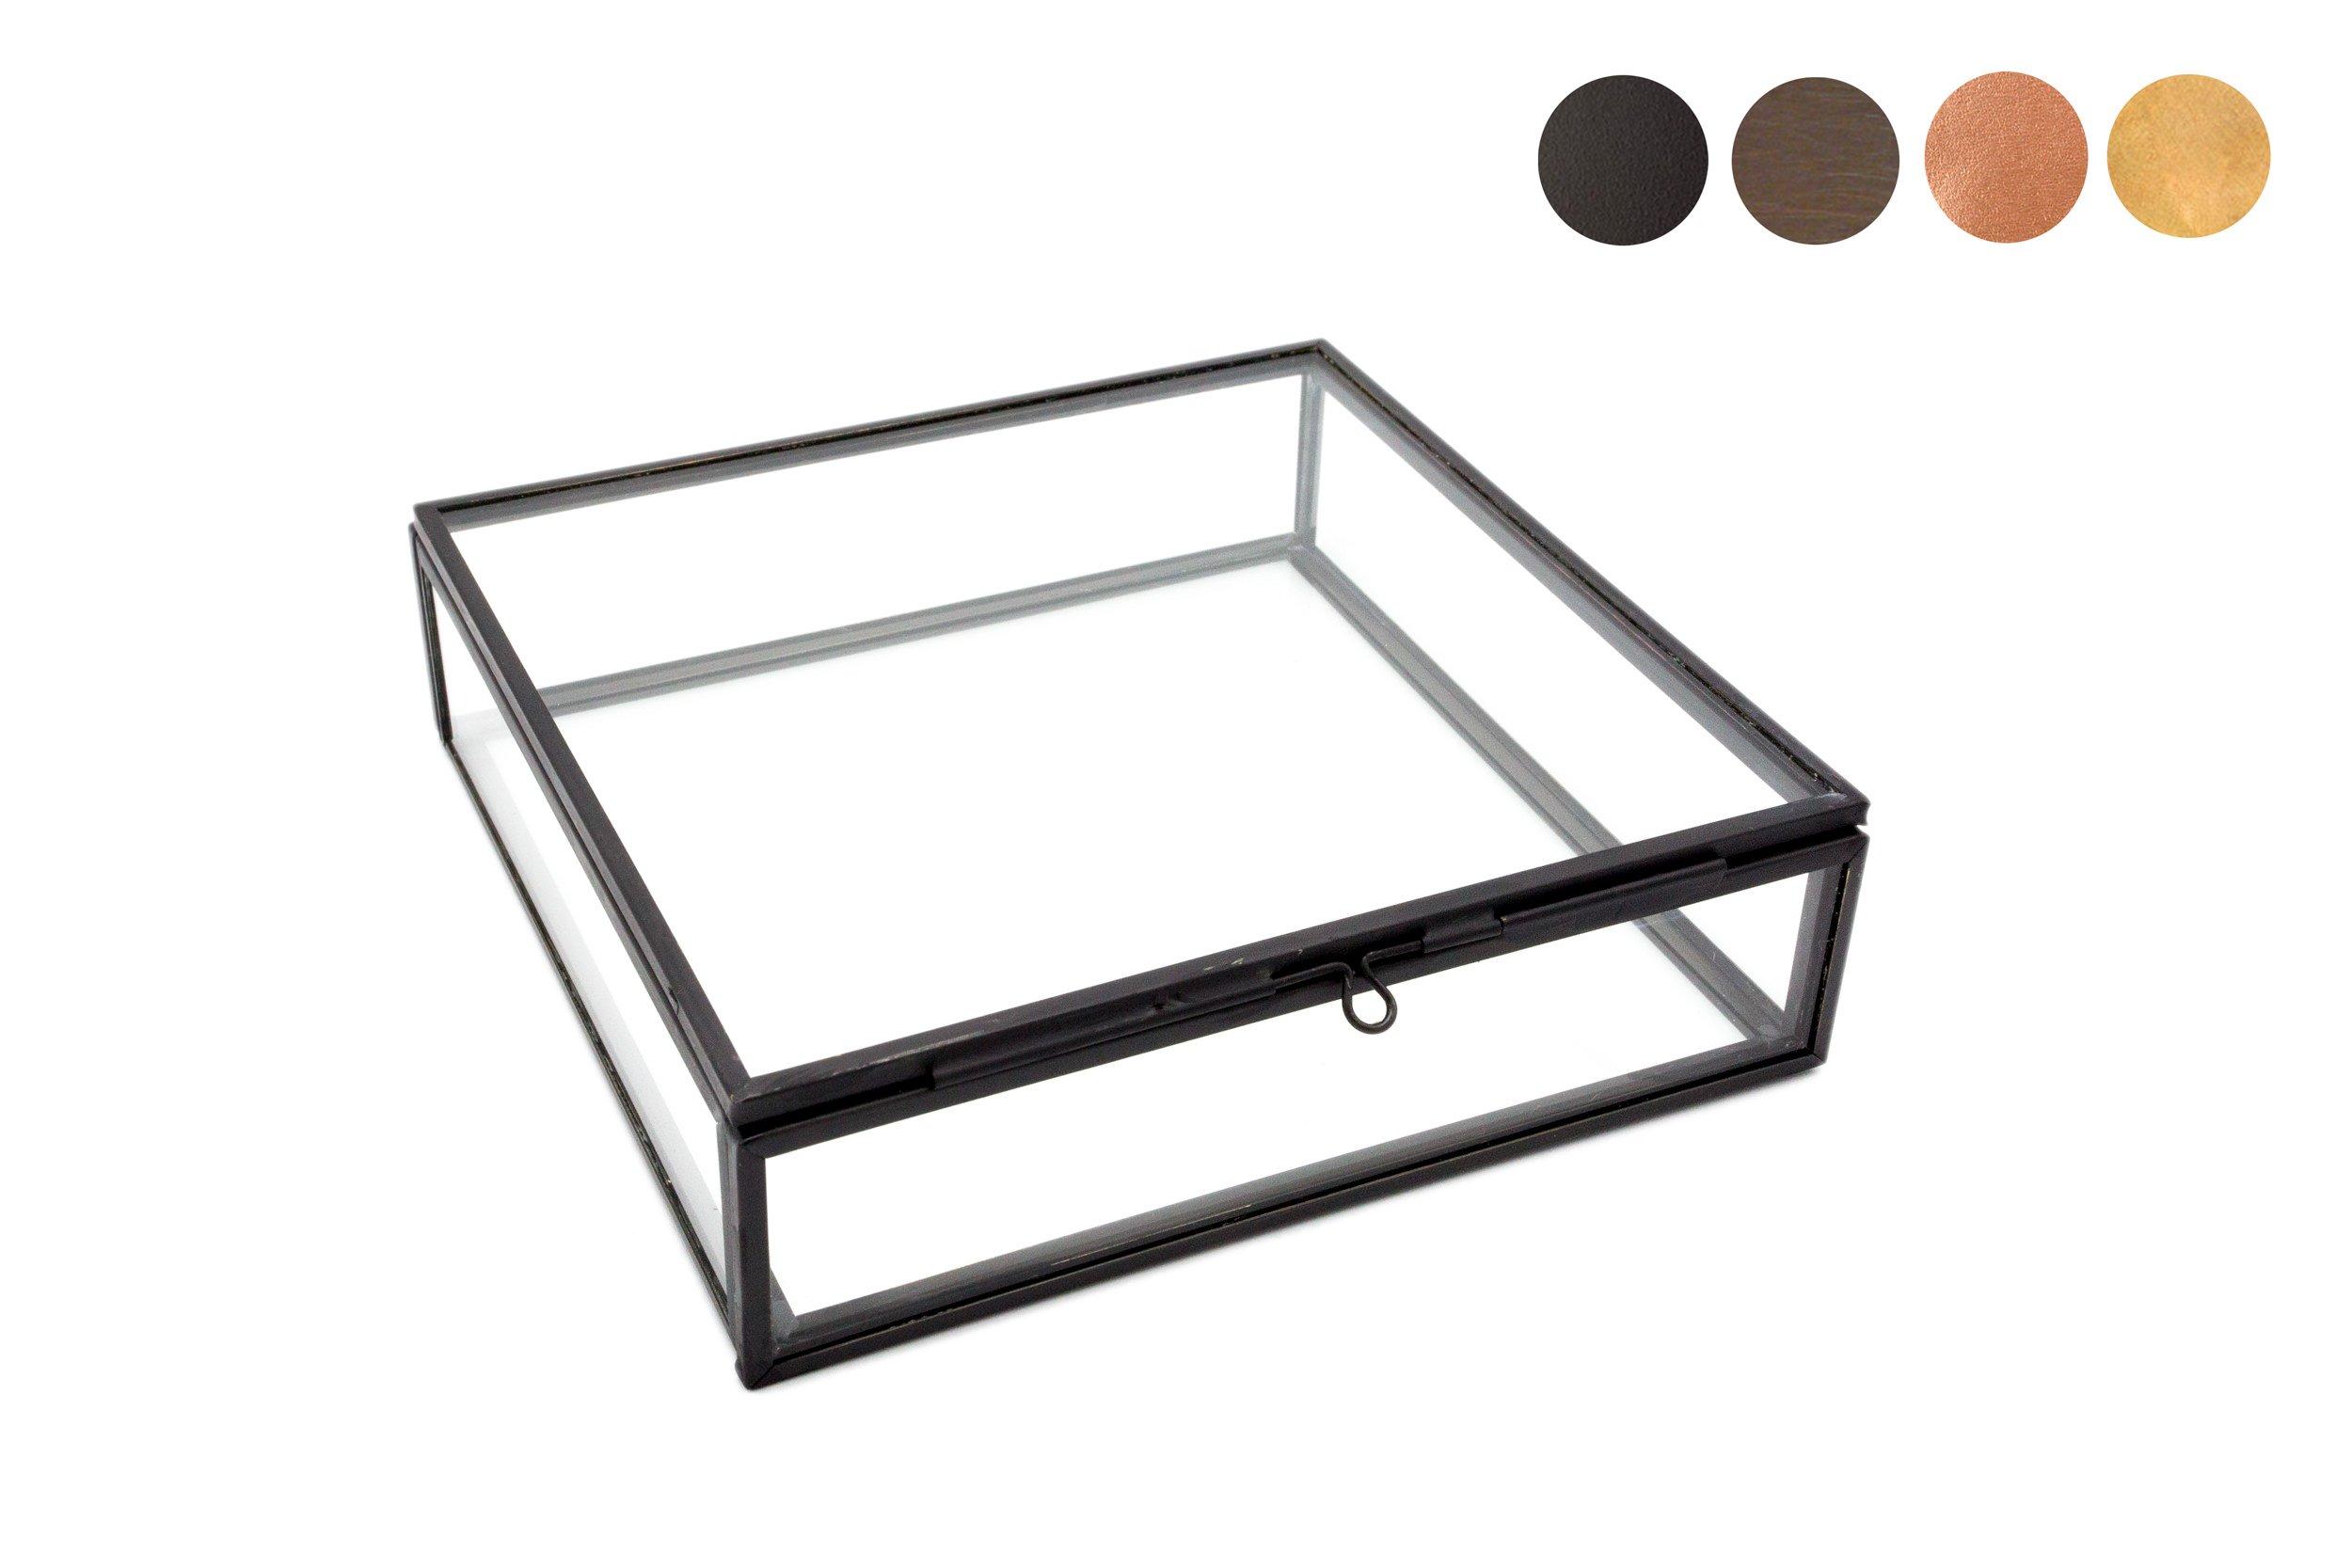 Photographer Boxes 5x5 Glass Photo Box, Proof Box, Shadow Box, Card Box, Jewelry Box, Black Glass Box